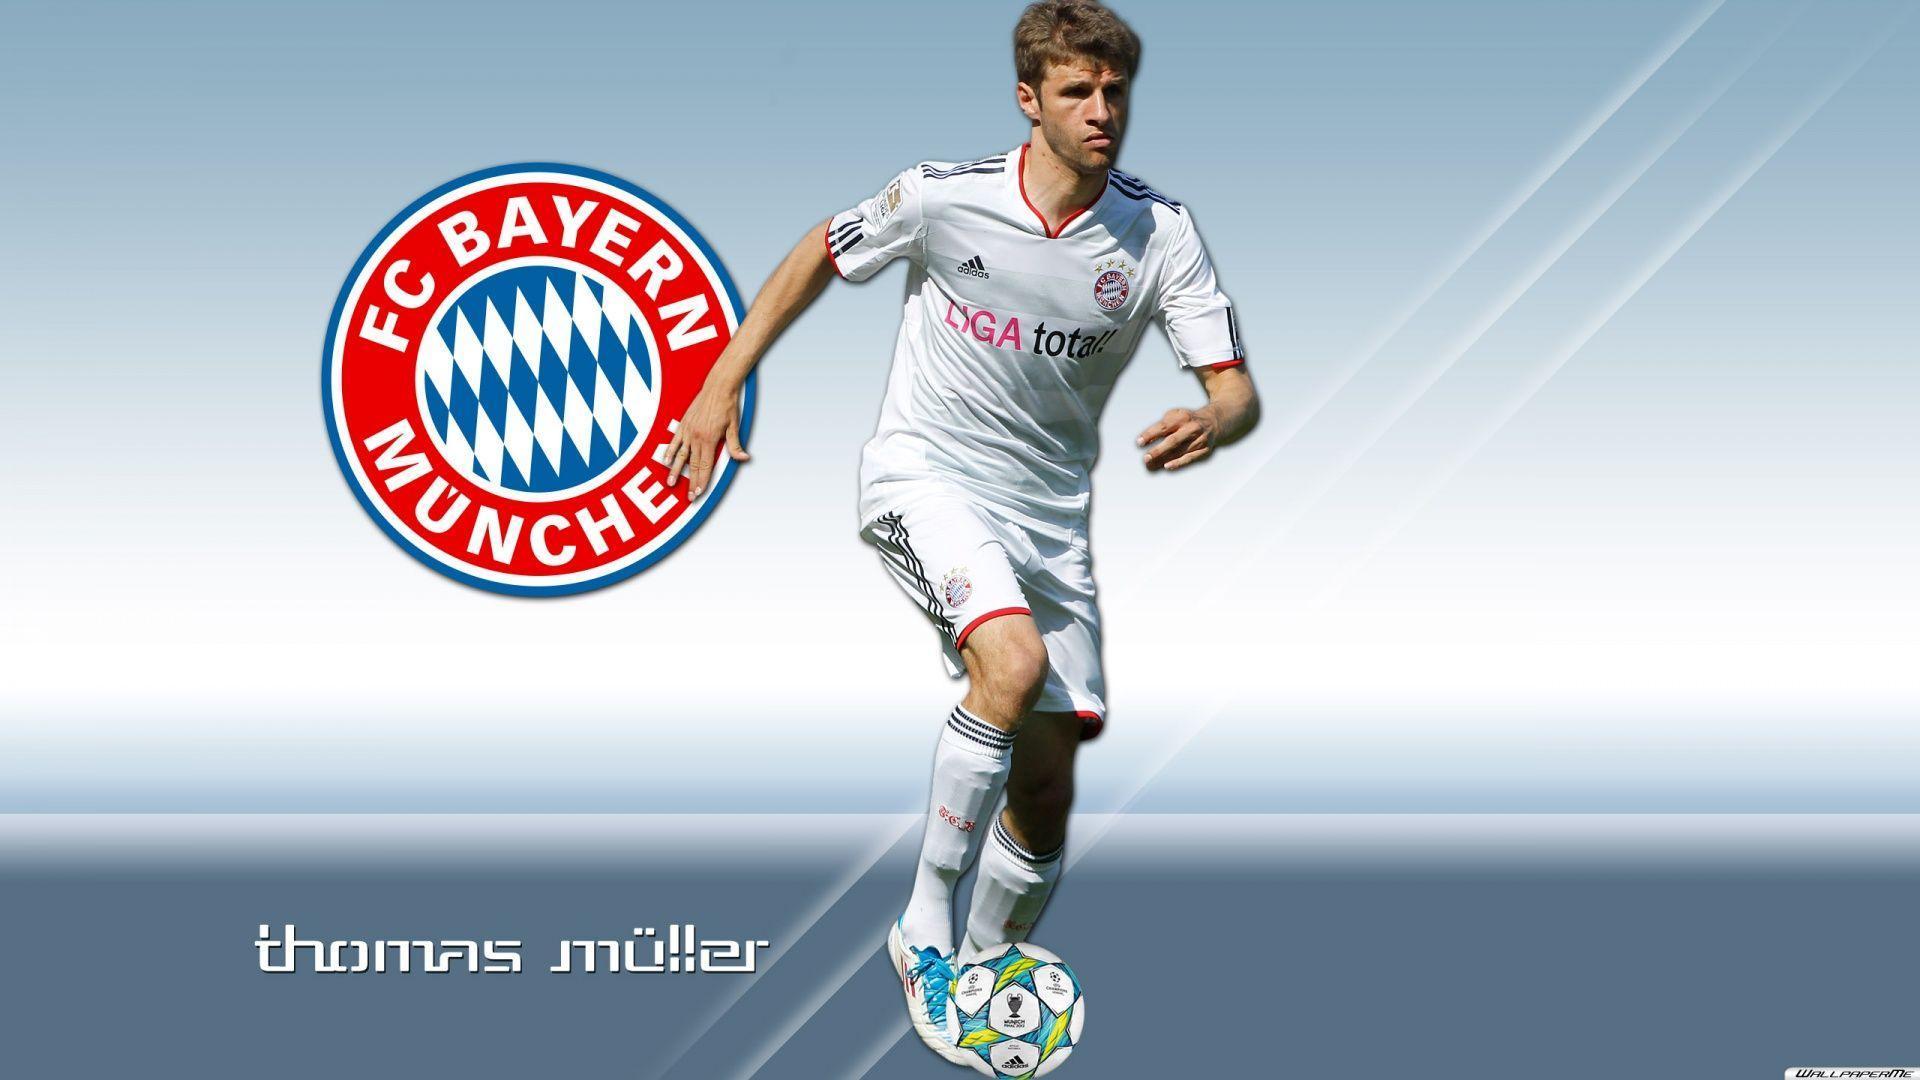 Thomas Muller Wallpapers - Top Free Thomas Muller Backgrounds -  WallpaperAccess